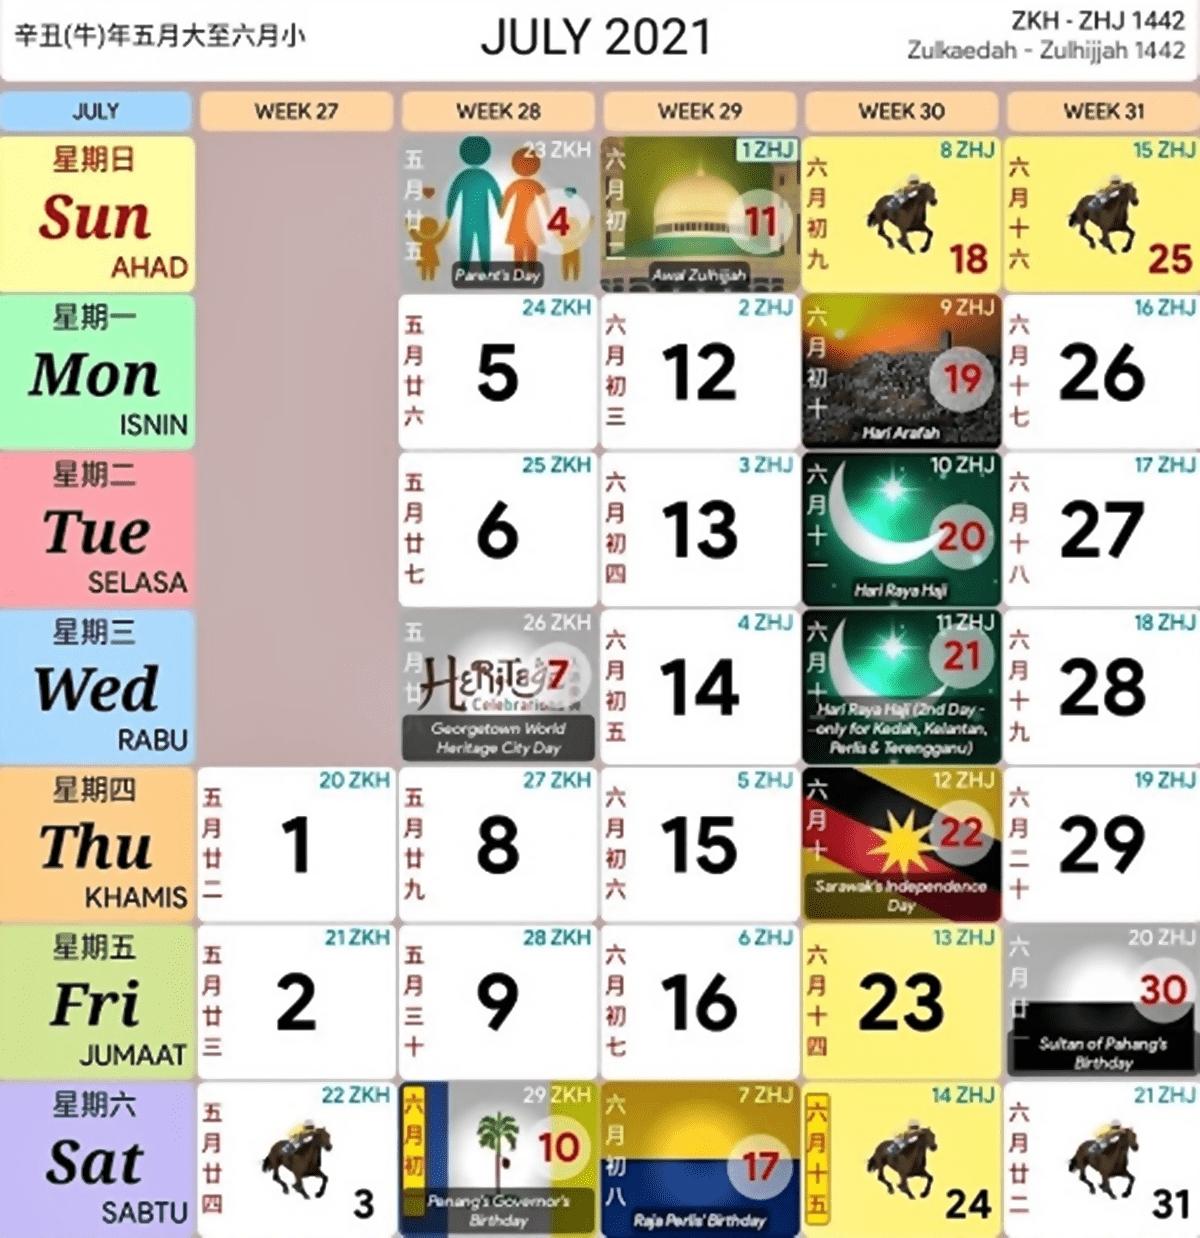 Kalendar 2021 Malaysia Senarai Perincian Cuti Umum Negeri throughout Kalendar 2021 Malaysia Cuti Sekolah